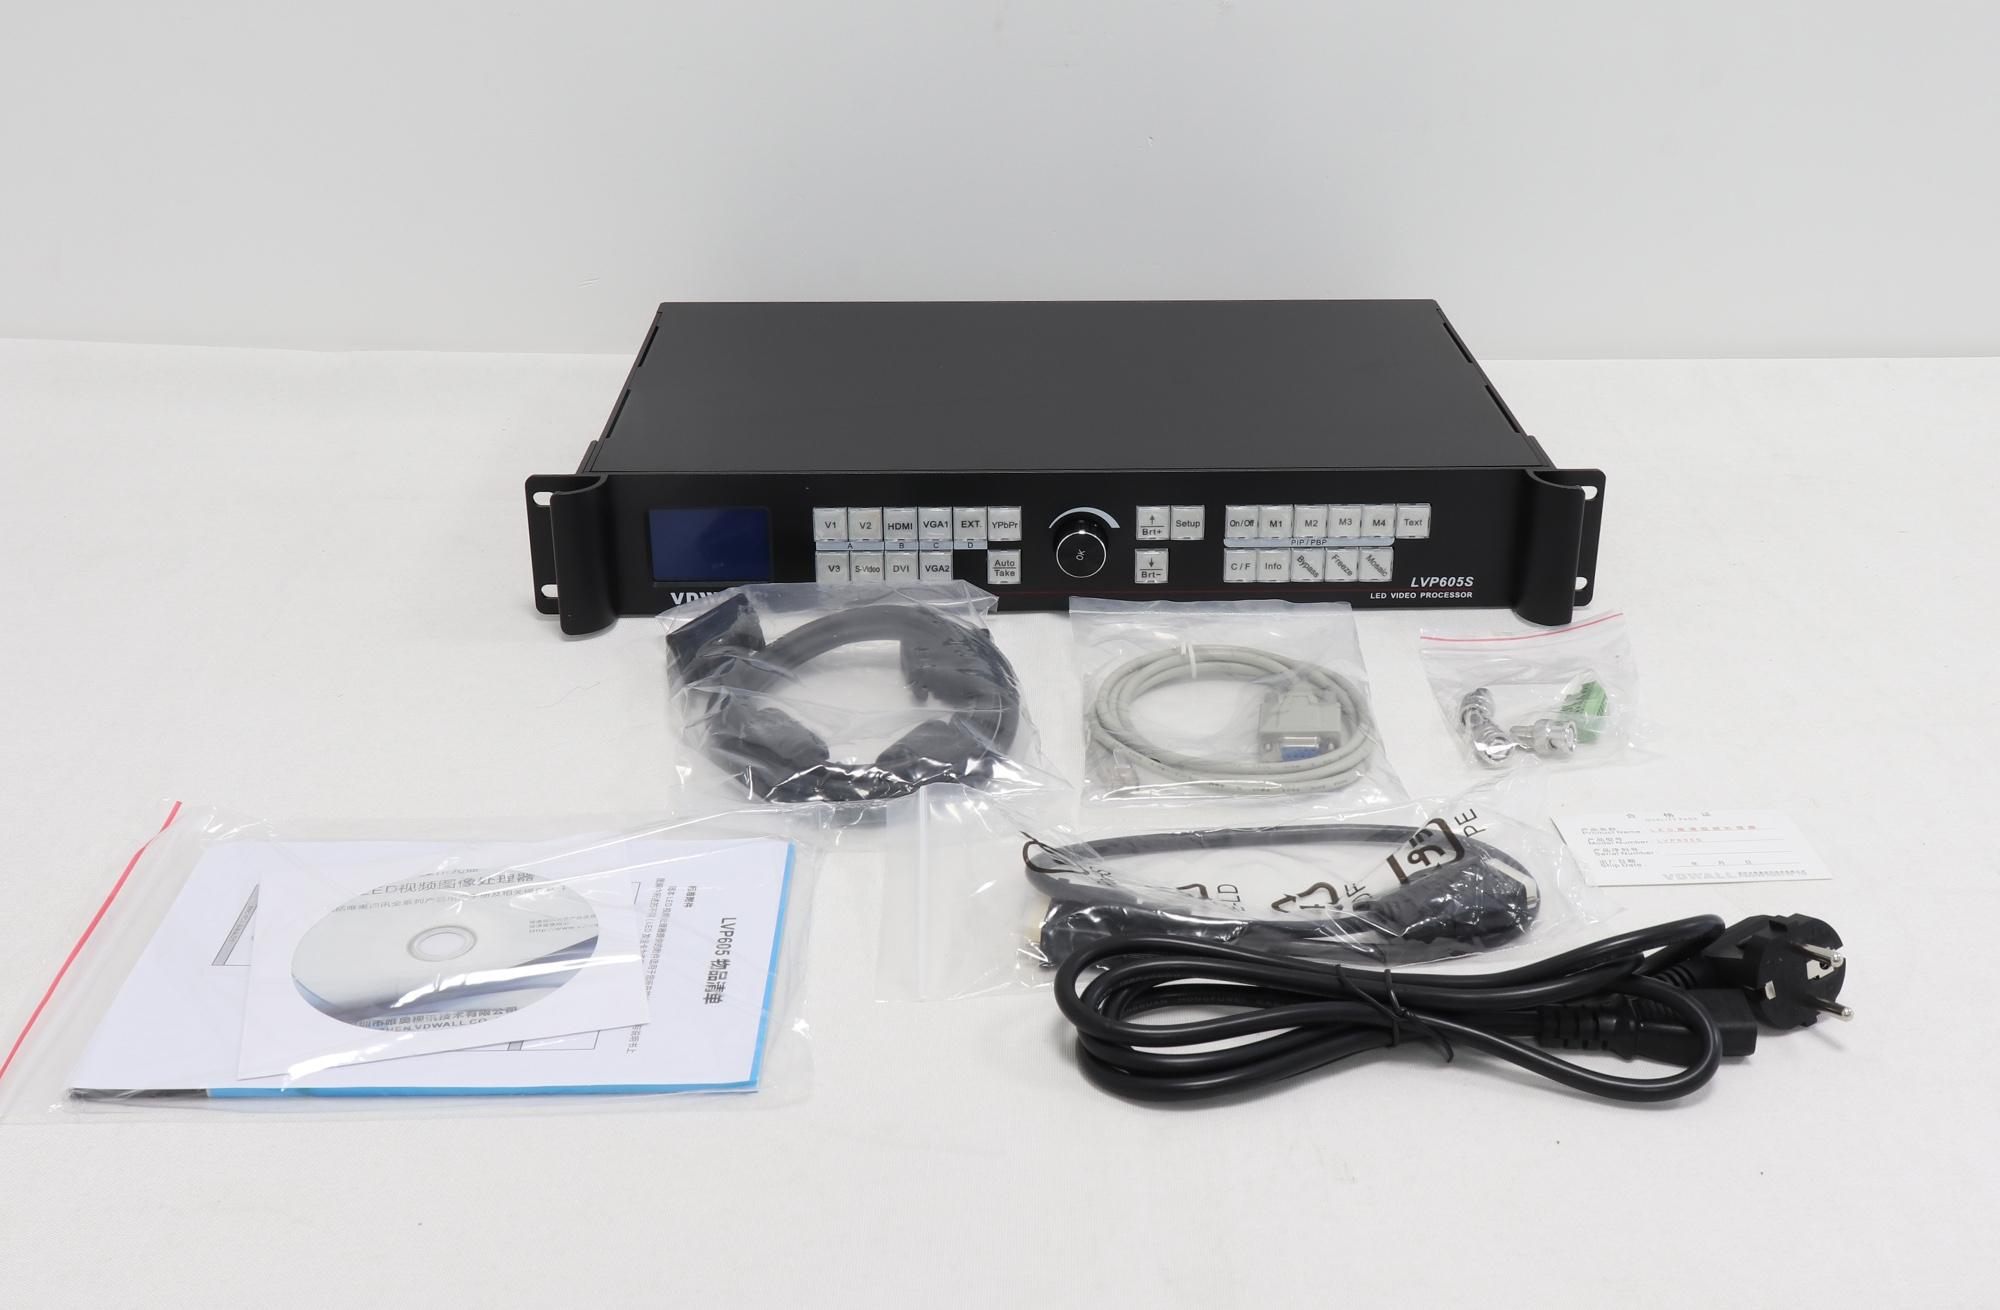 VDWALL LVP605S HD LED Video Montage Processor With HD-SDI,SDI